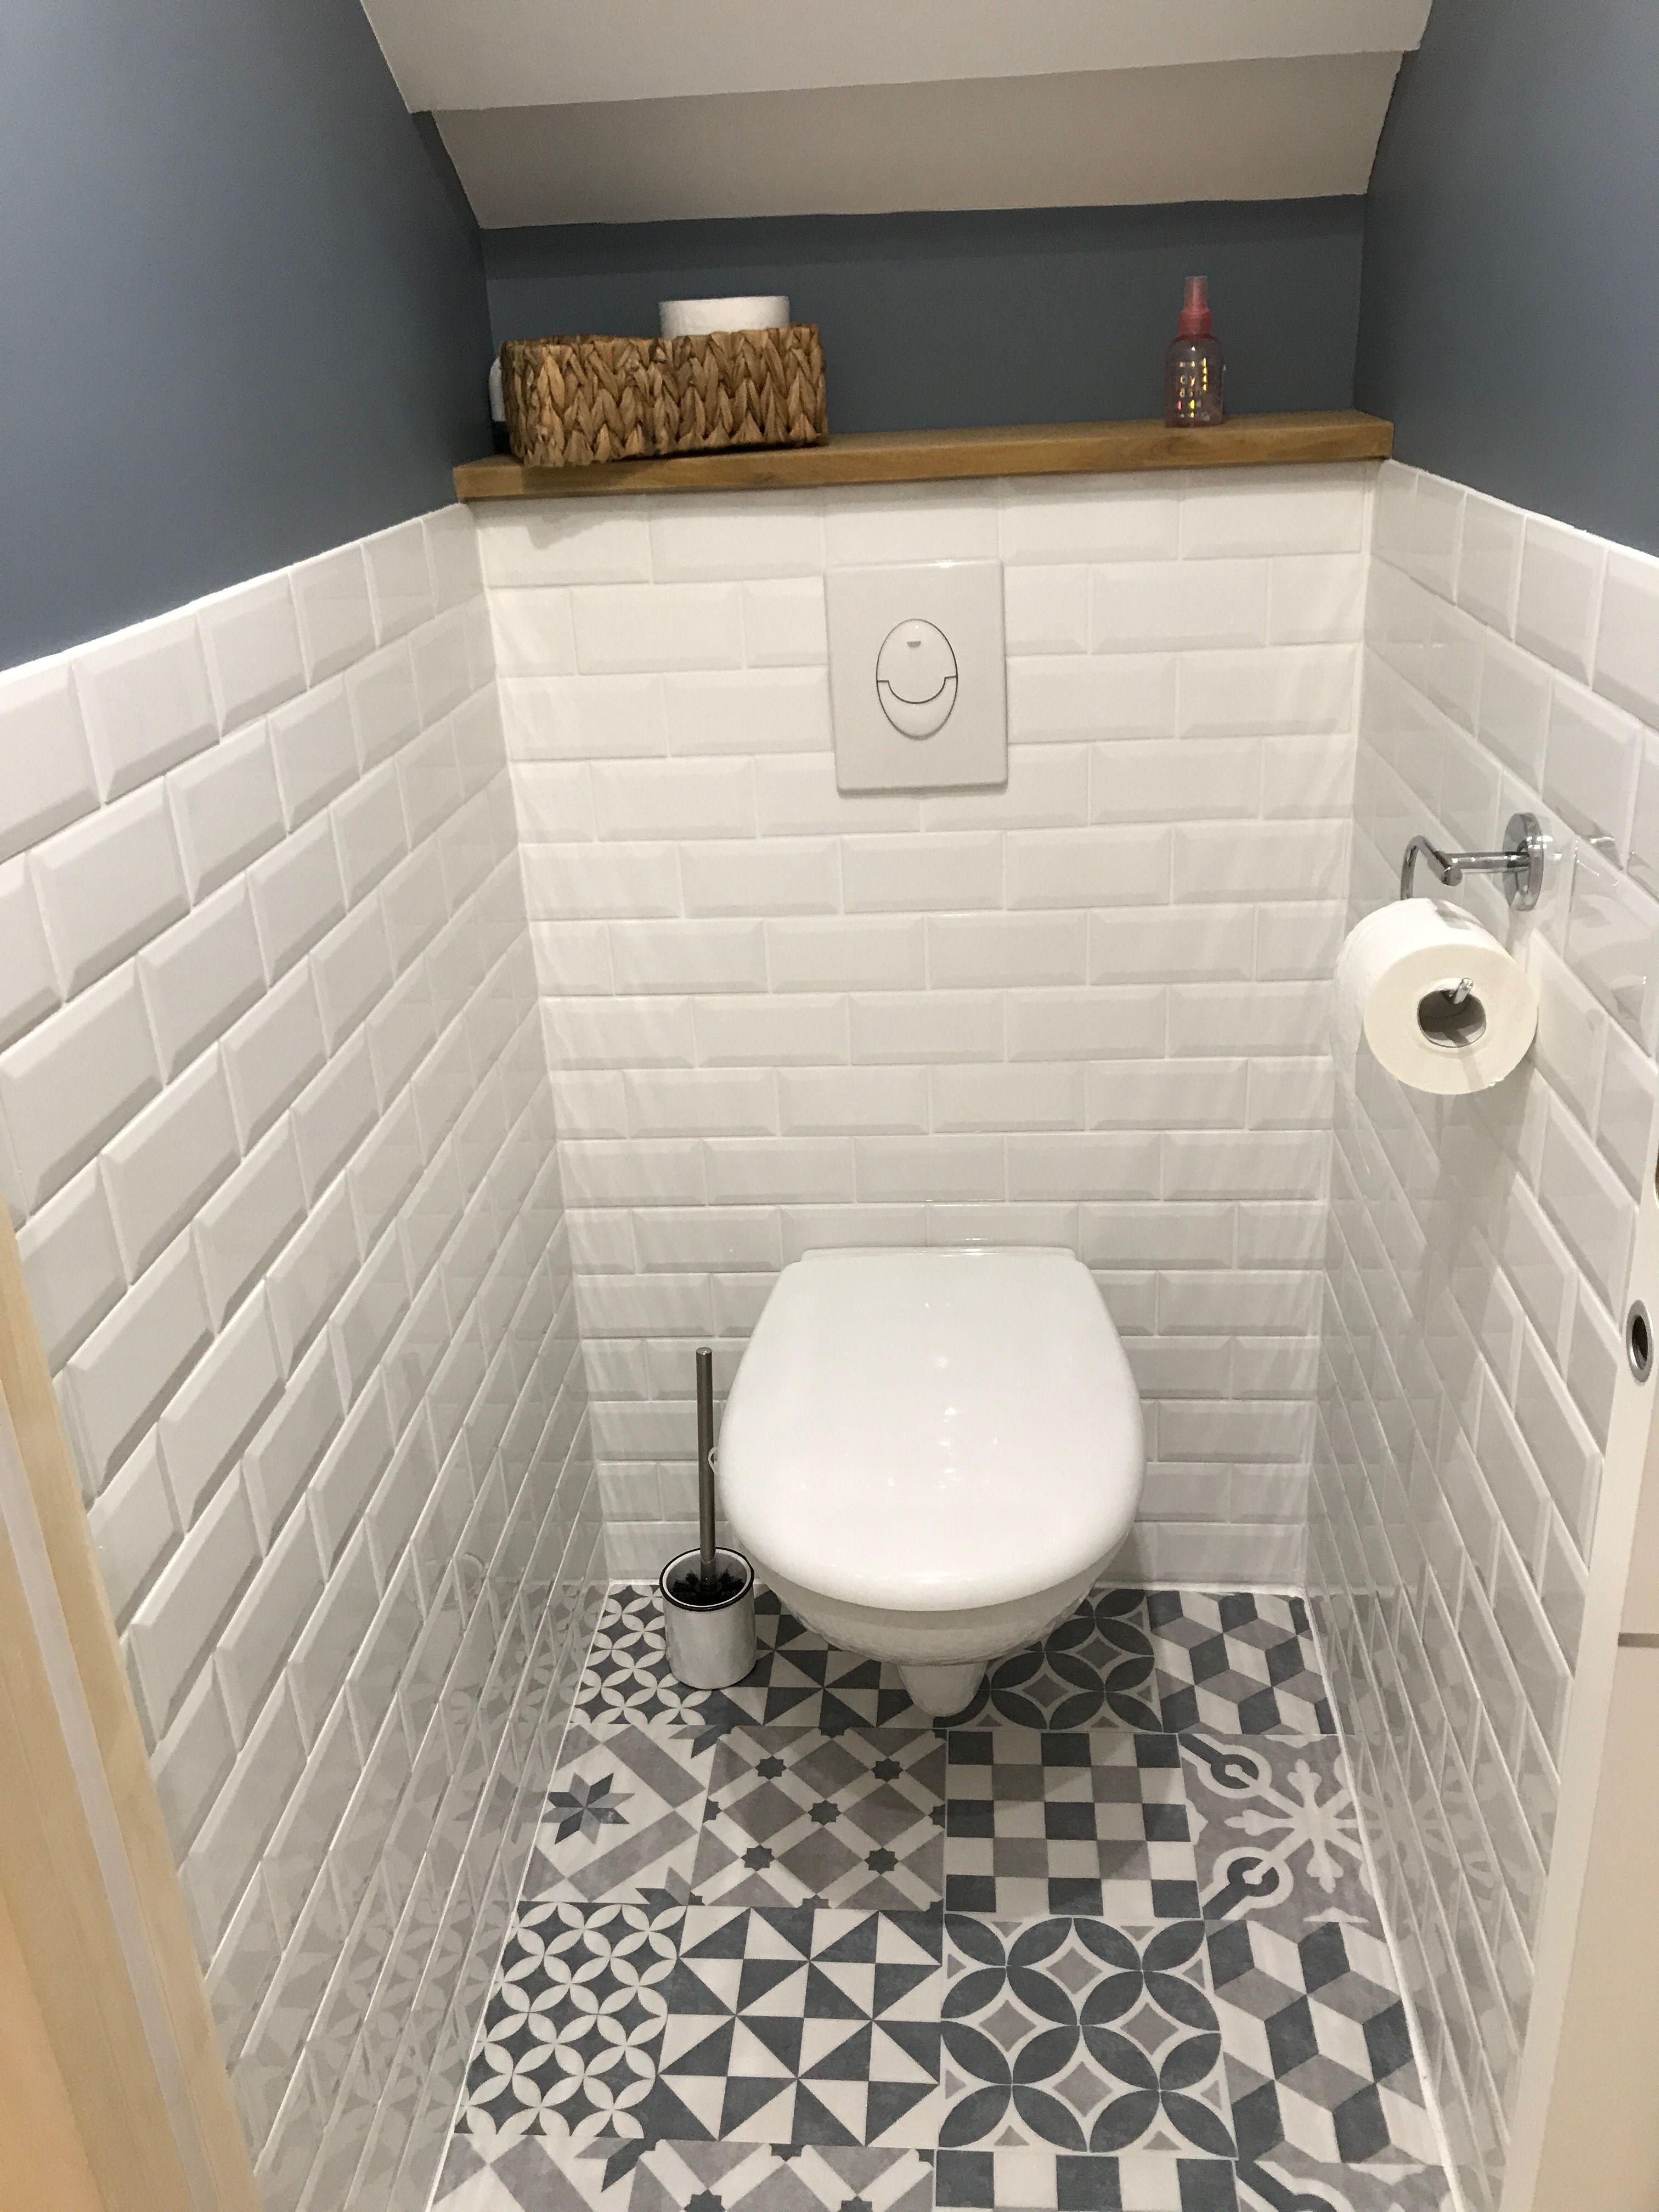 Deco Wc Suspendu Idee Toilettes Deco Wc Suspendu Decoration Toilettes